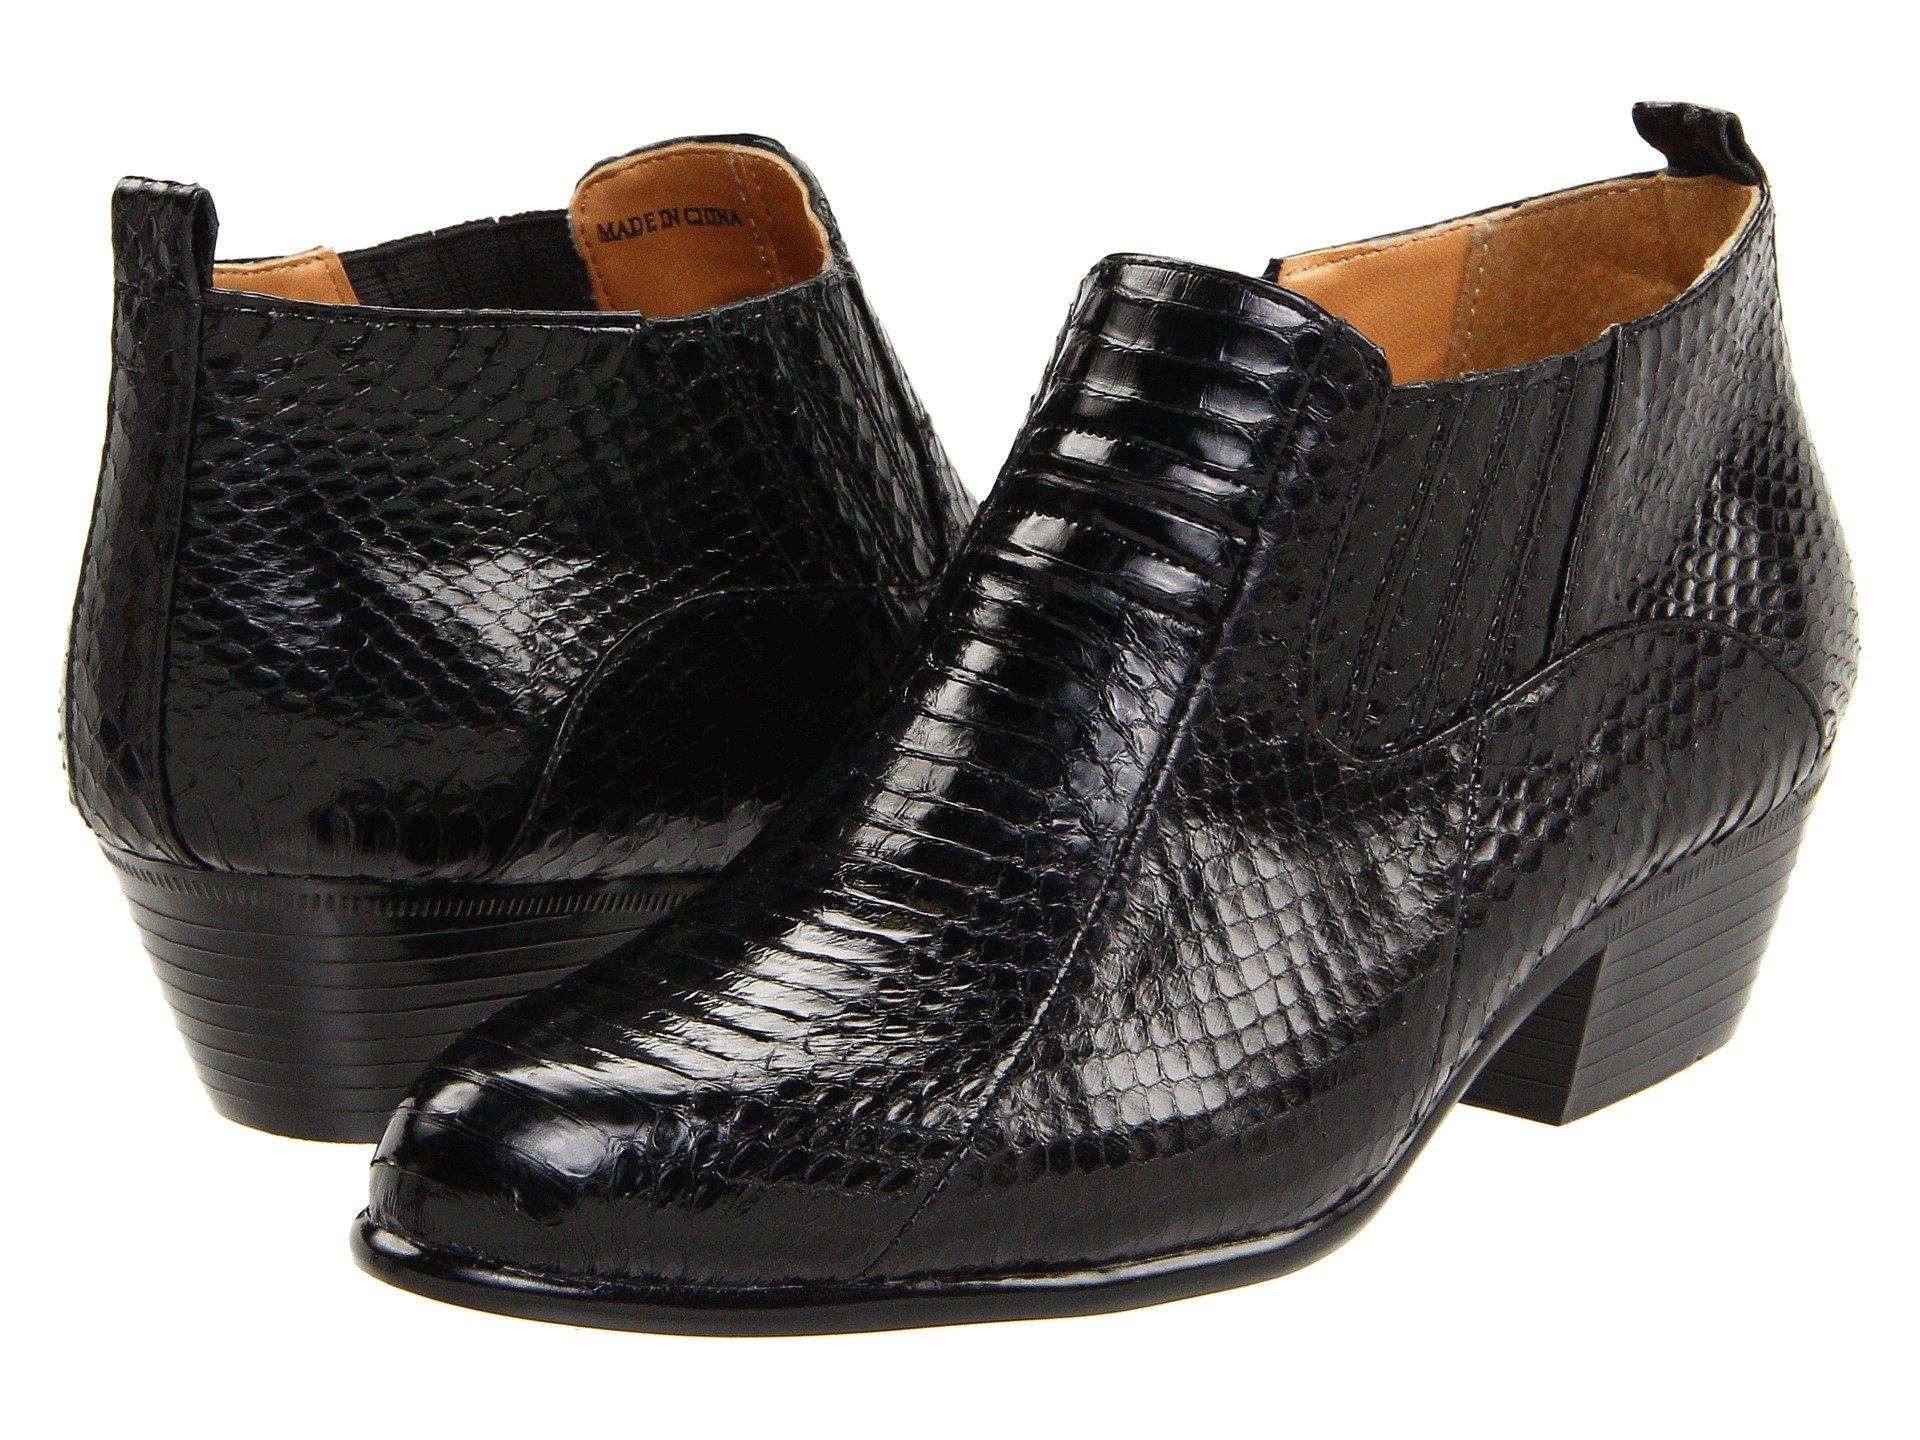 9f1b2b67de7 Men s Giorgio Brutini Shoes + FREE SHIPPING   Zappos